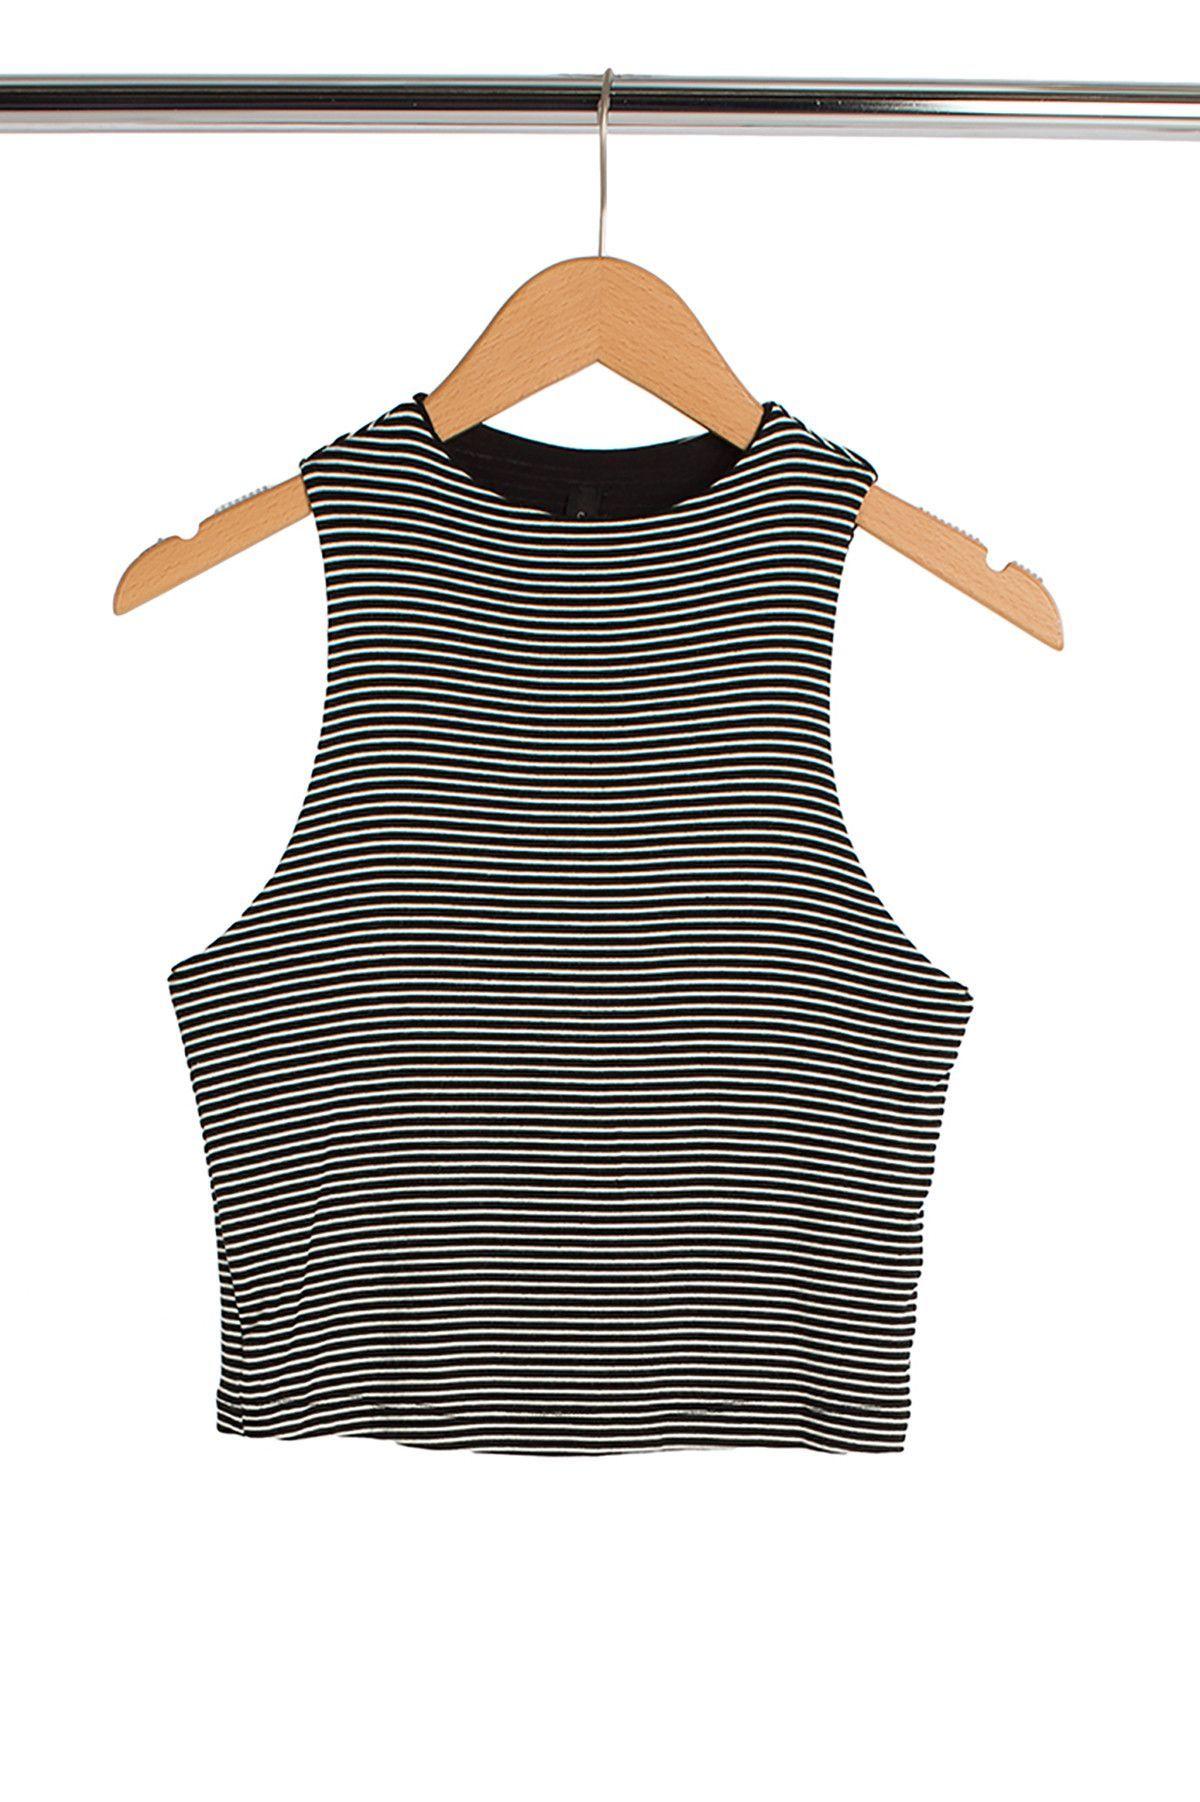 Black + White Striped Crop Top